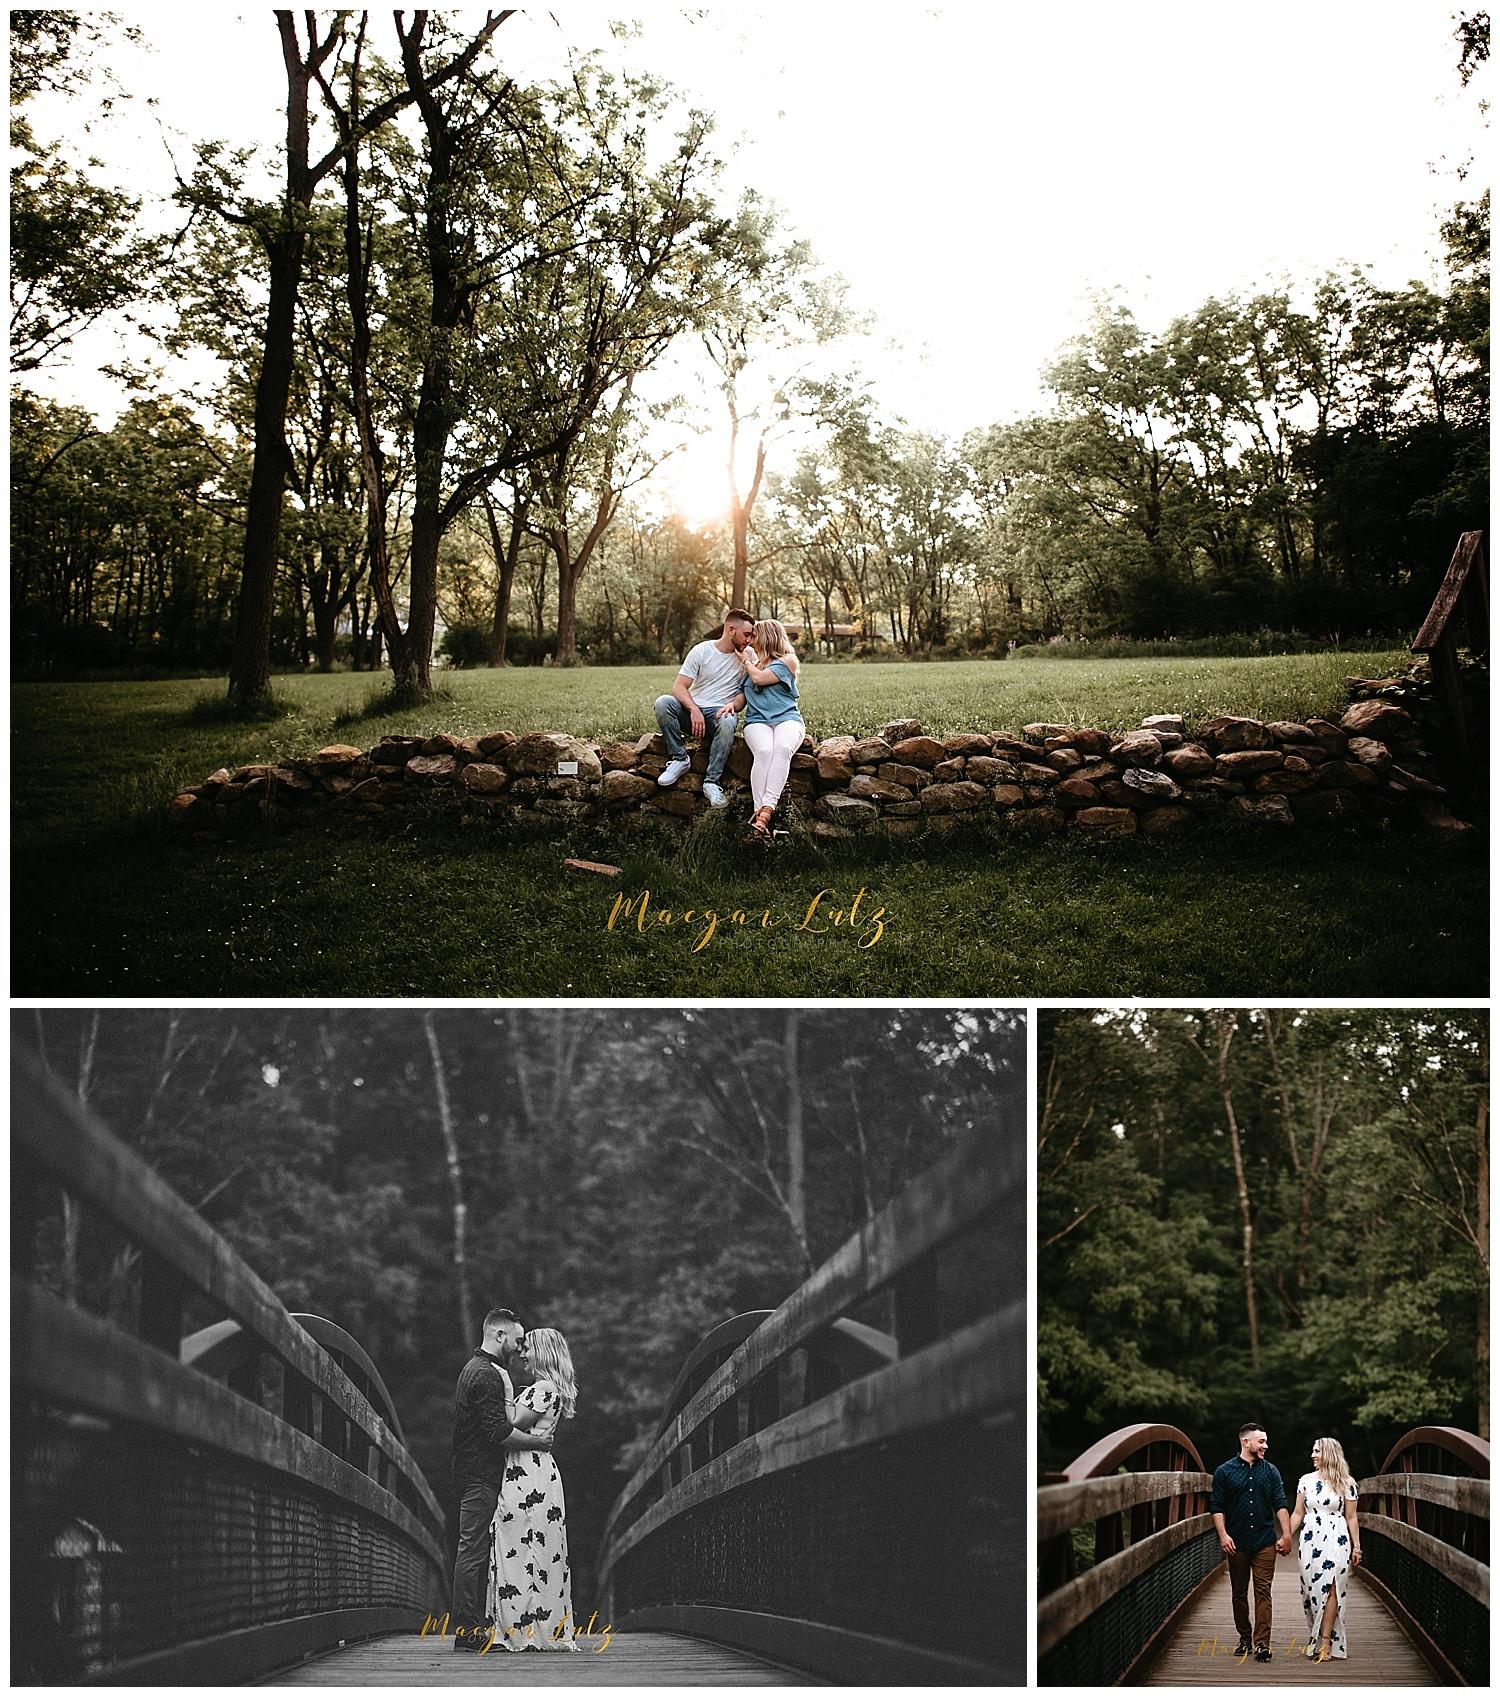 NEPA-wedding-engagement-photographer-Jacobsburg-state-park-Easton-PA_0049.jpg